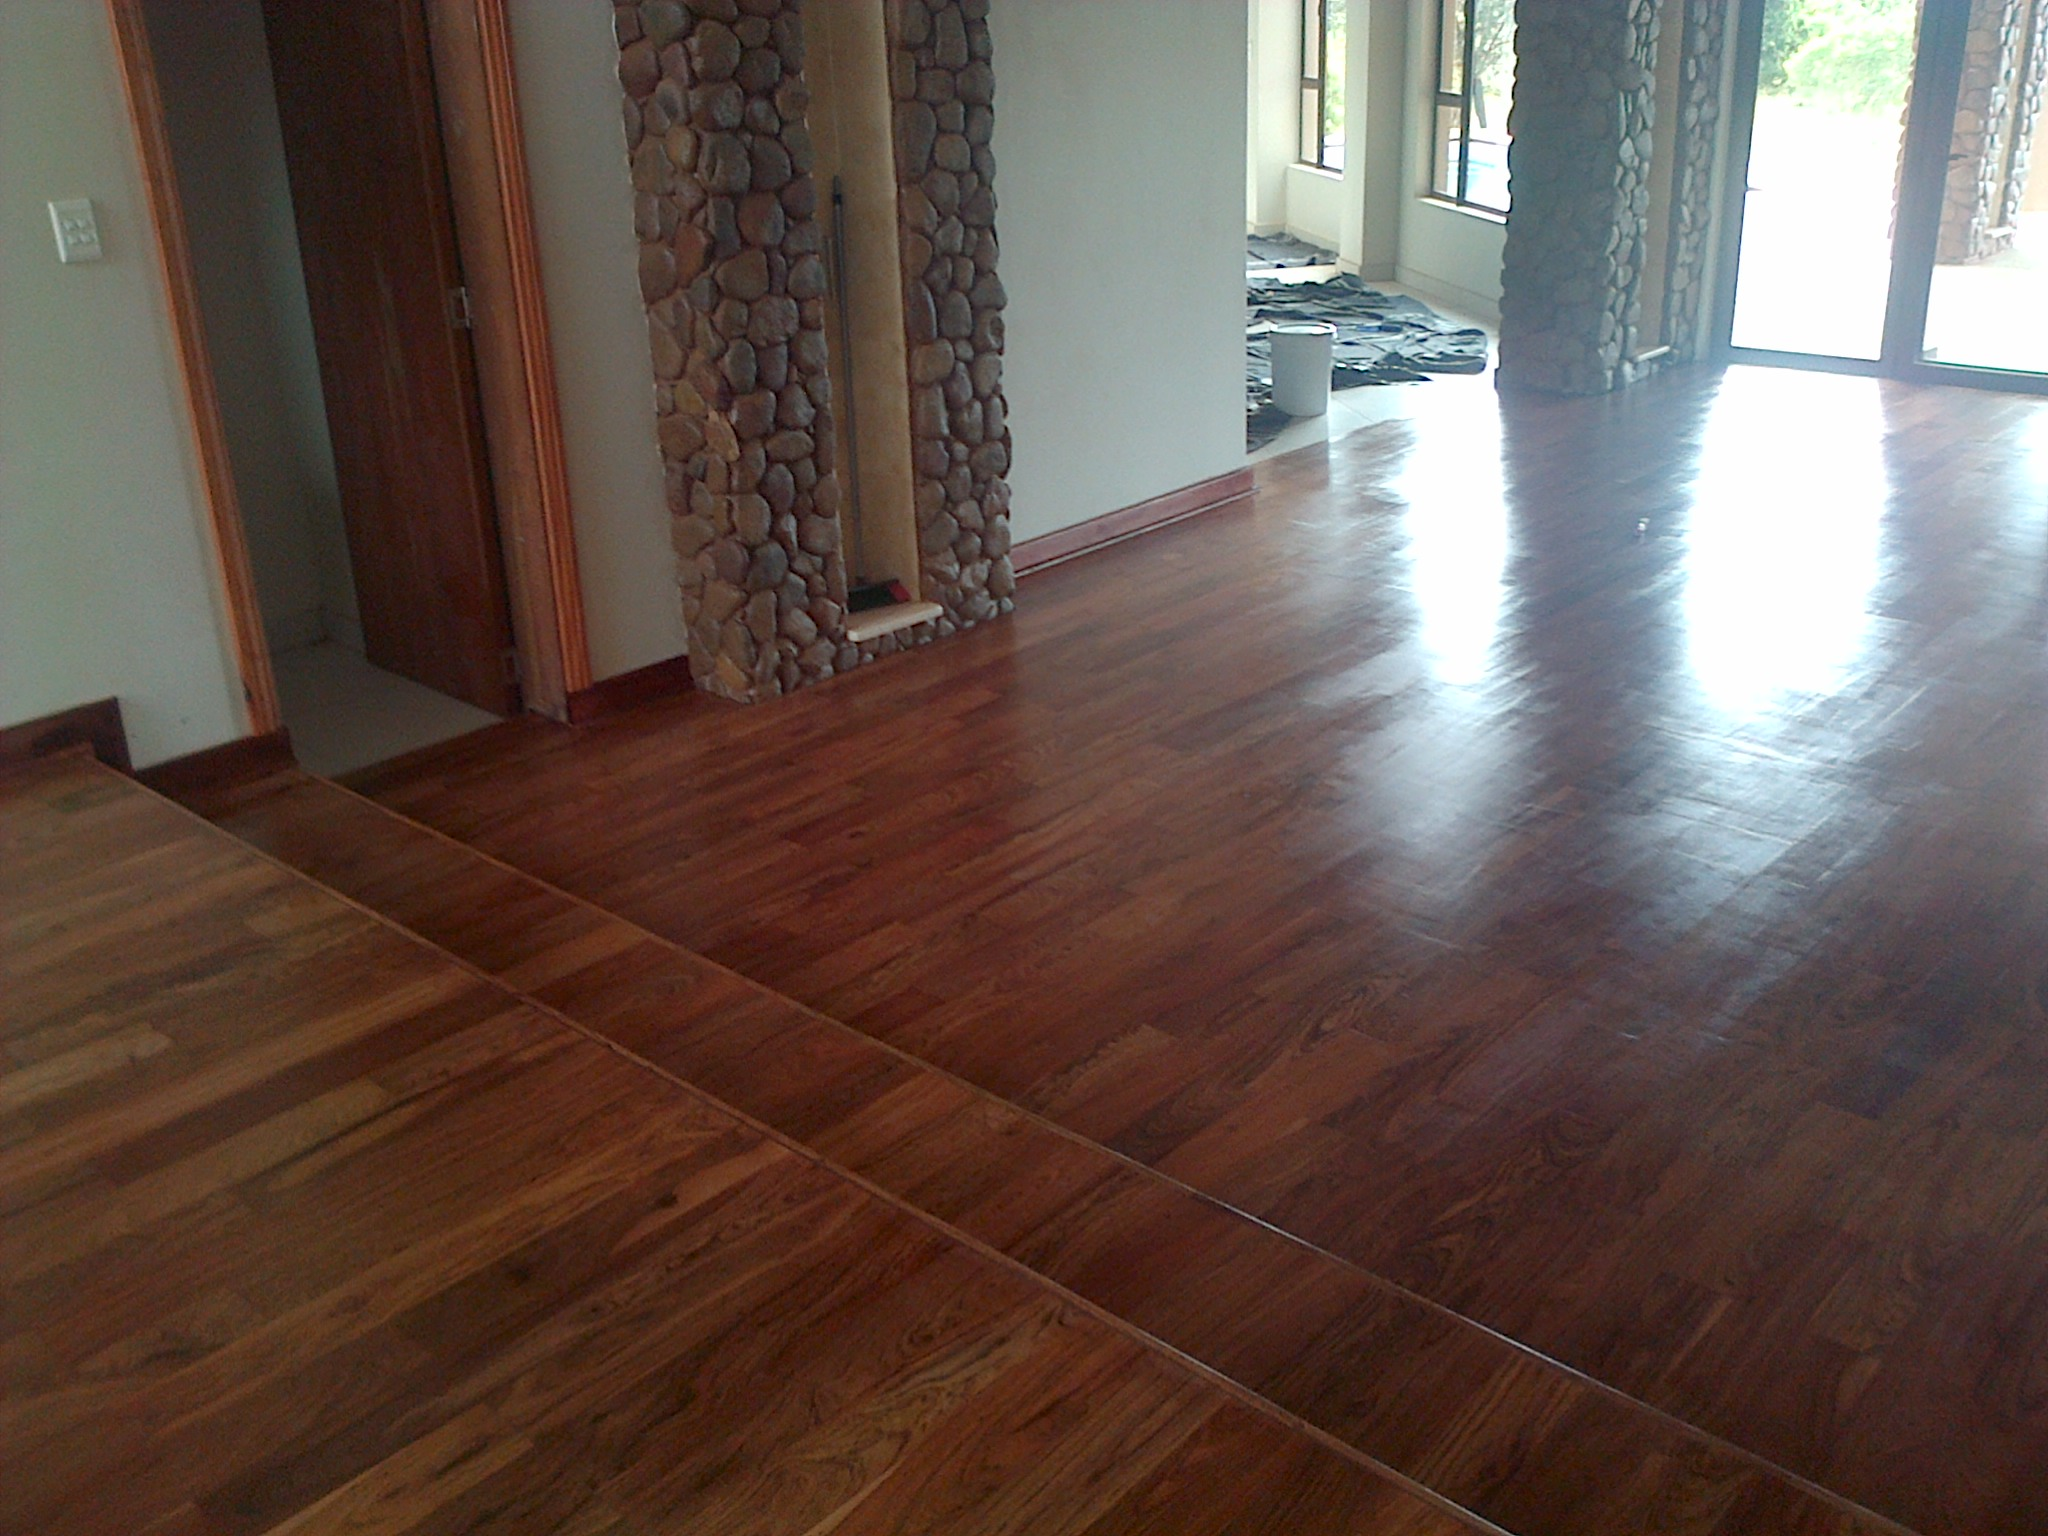 Hardwood Flooring panies in Durban – The Wood Joint